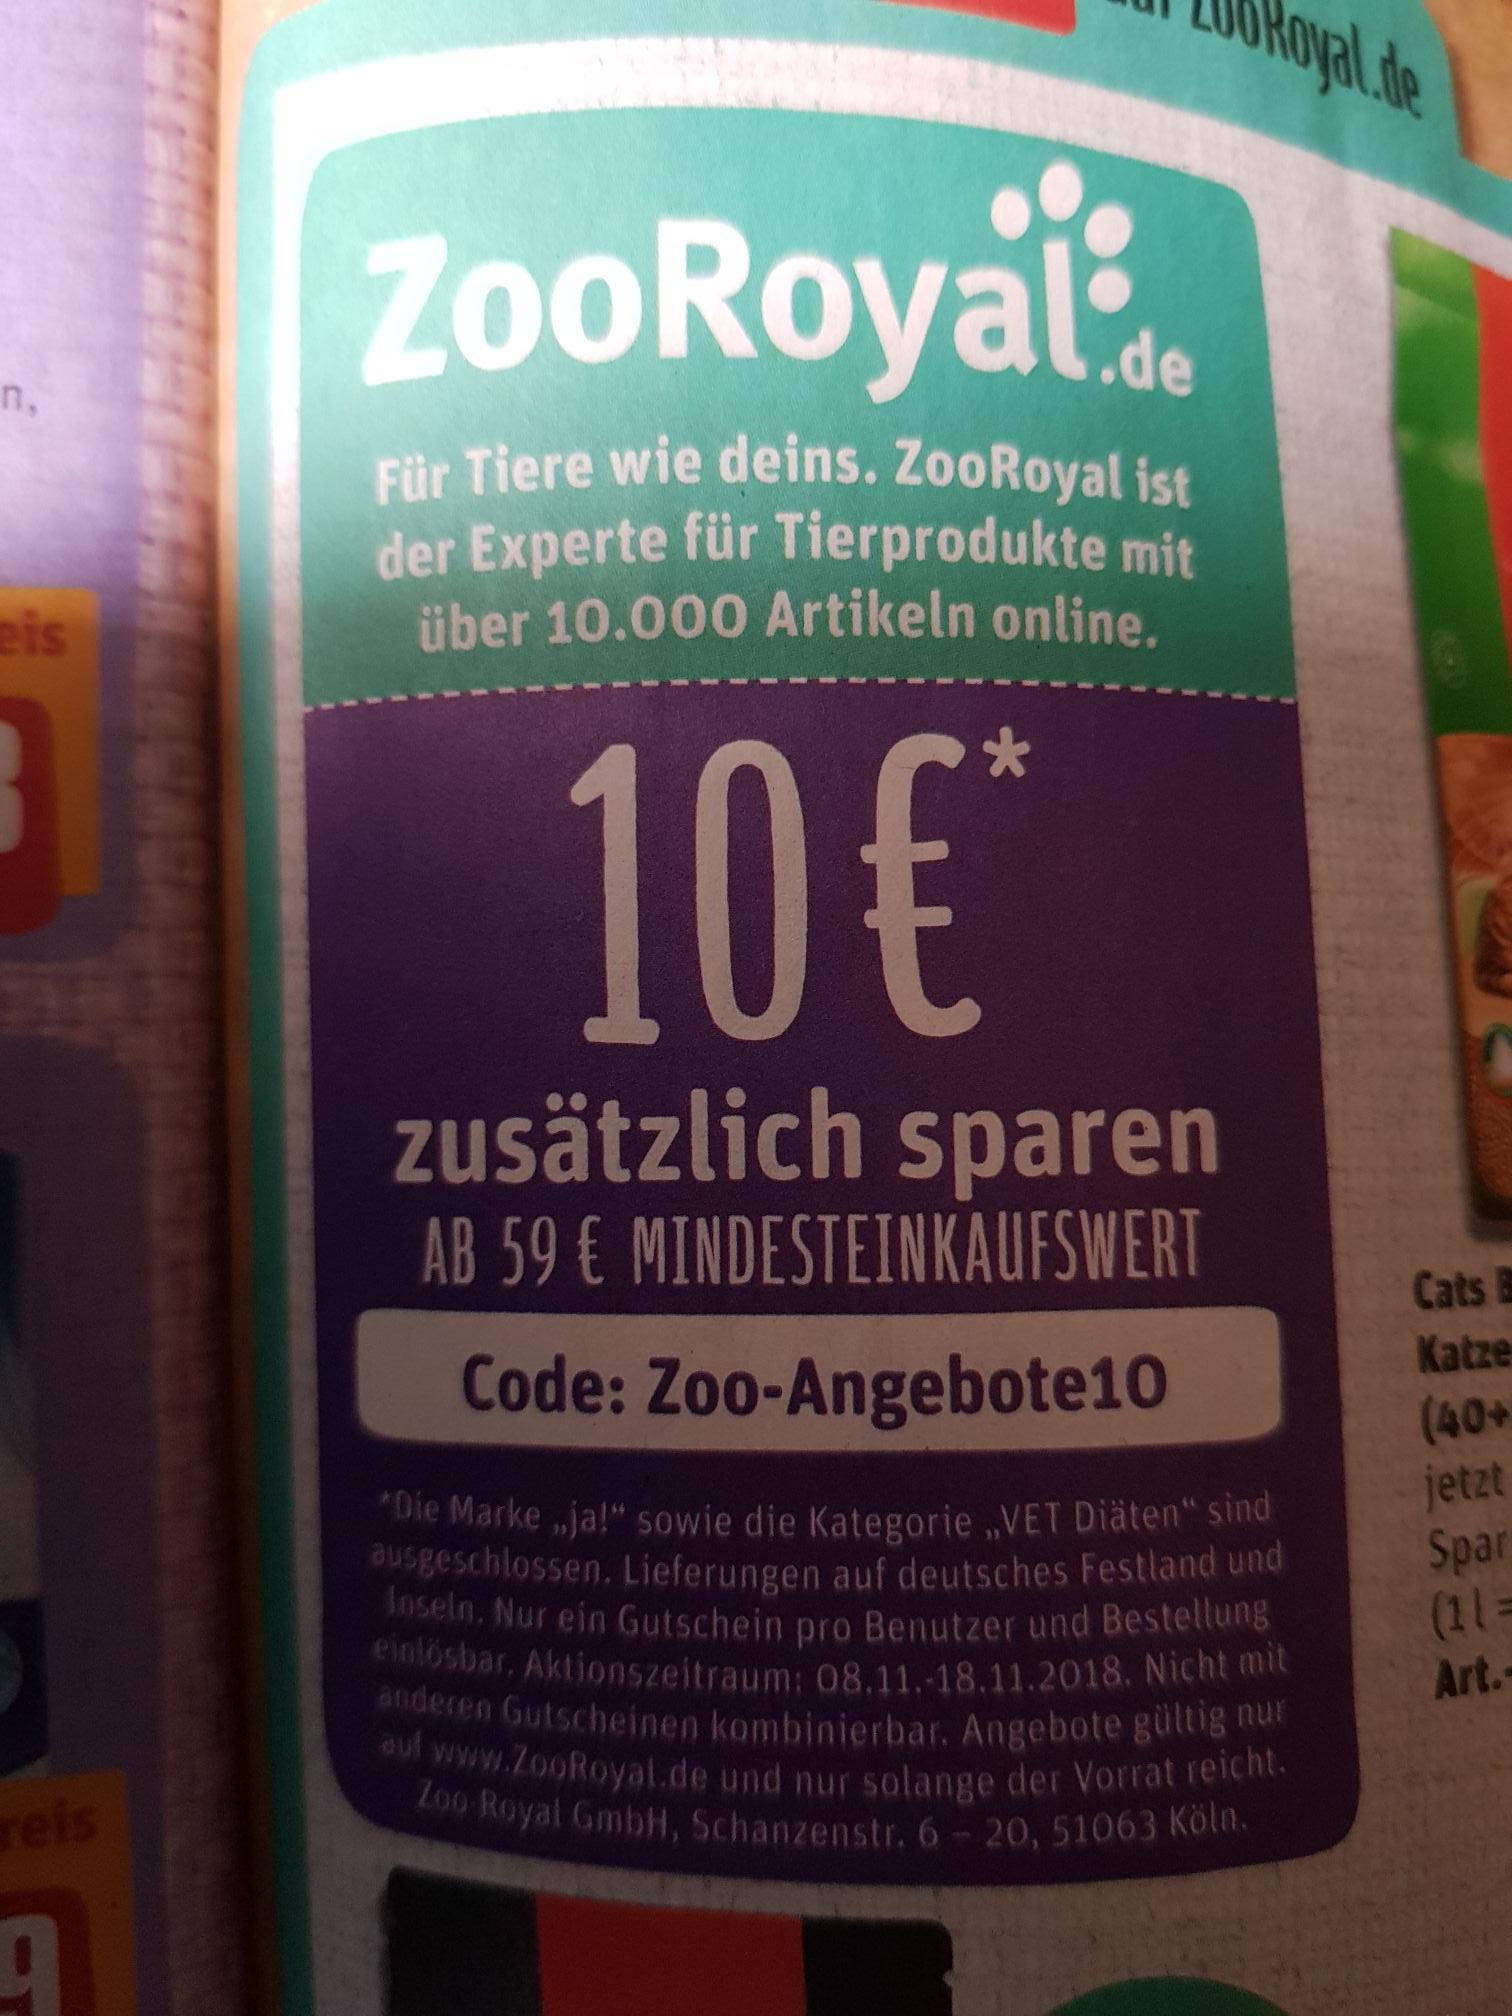 10€ sparen bei ZooRoyal (MBW 59€)